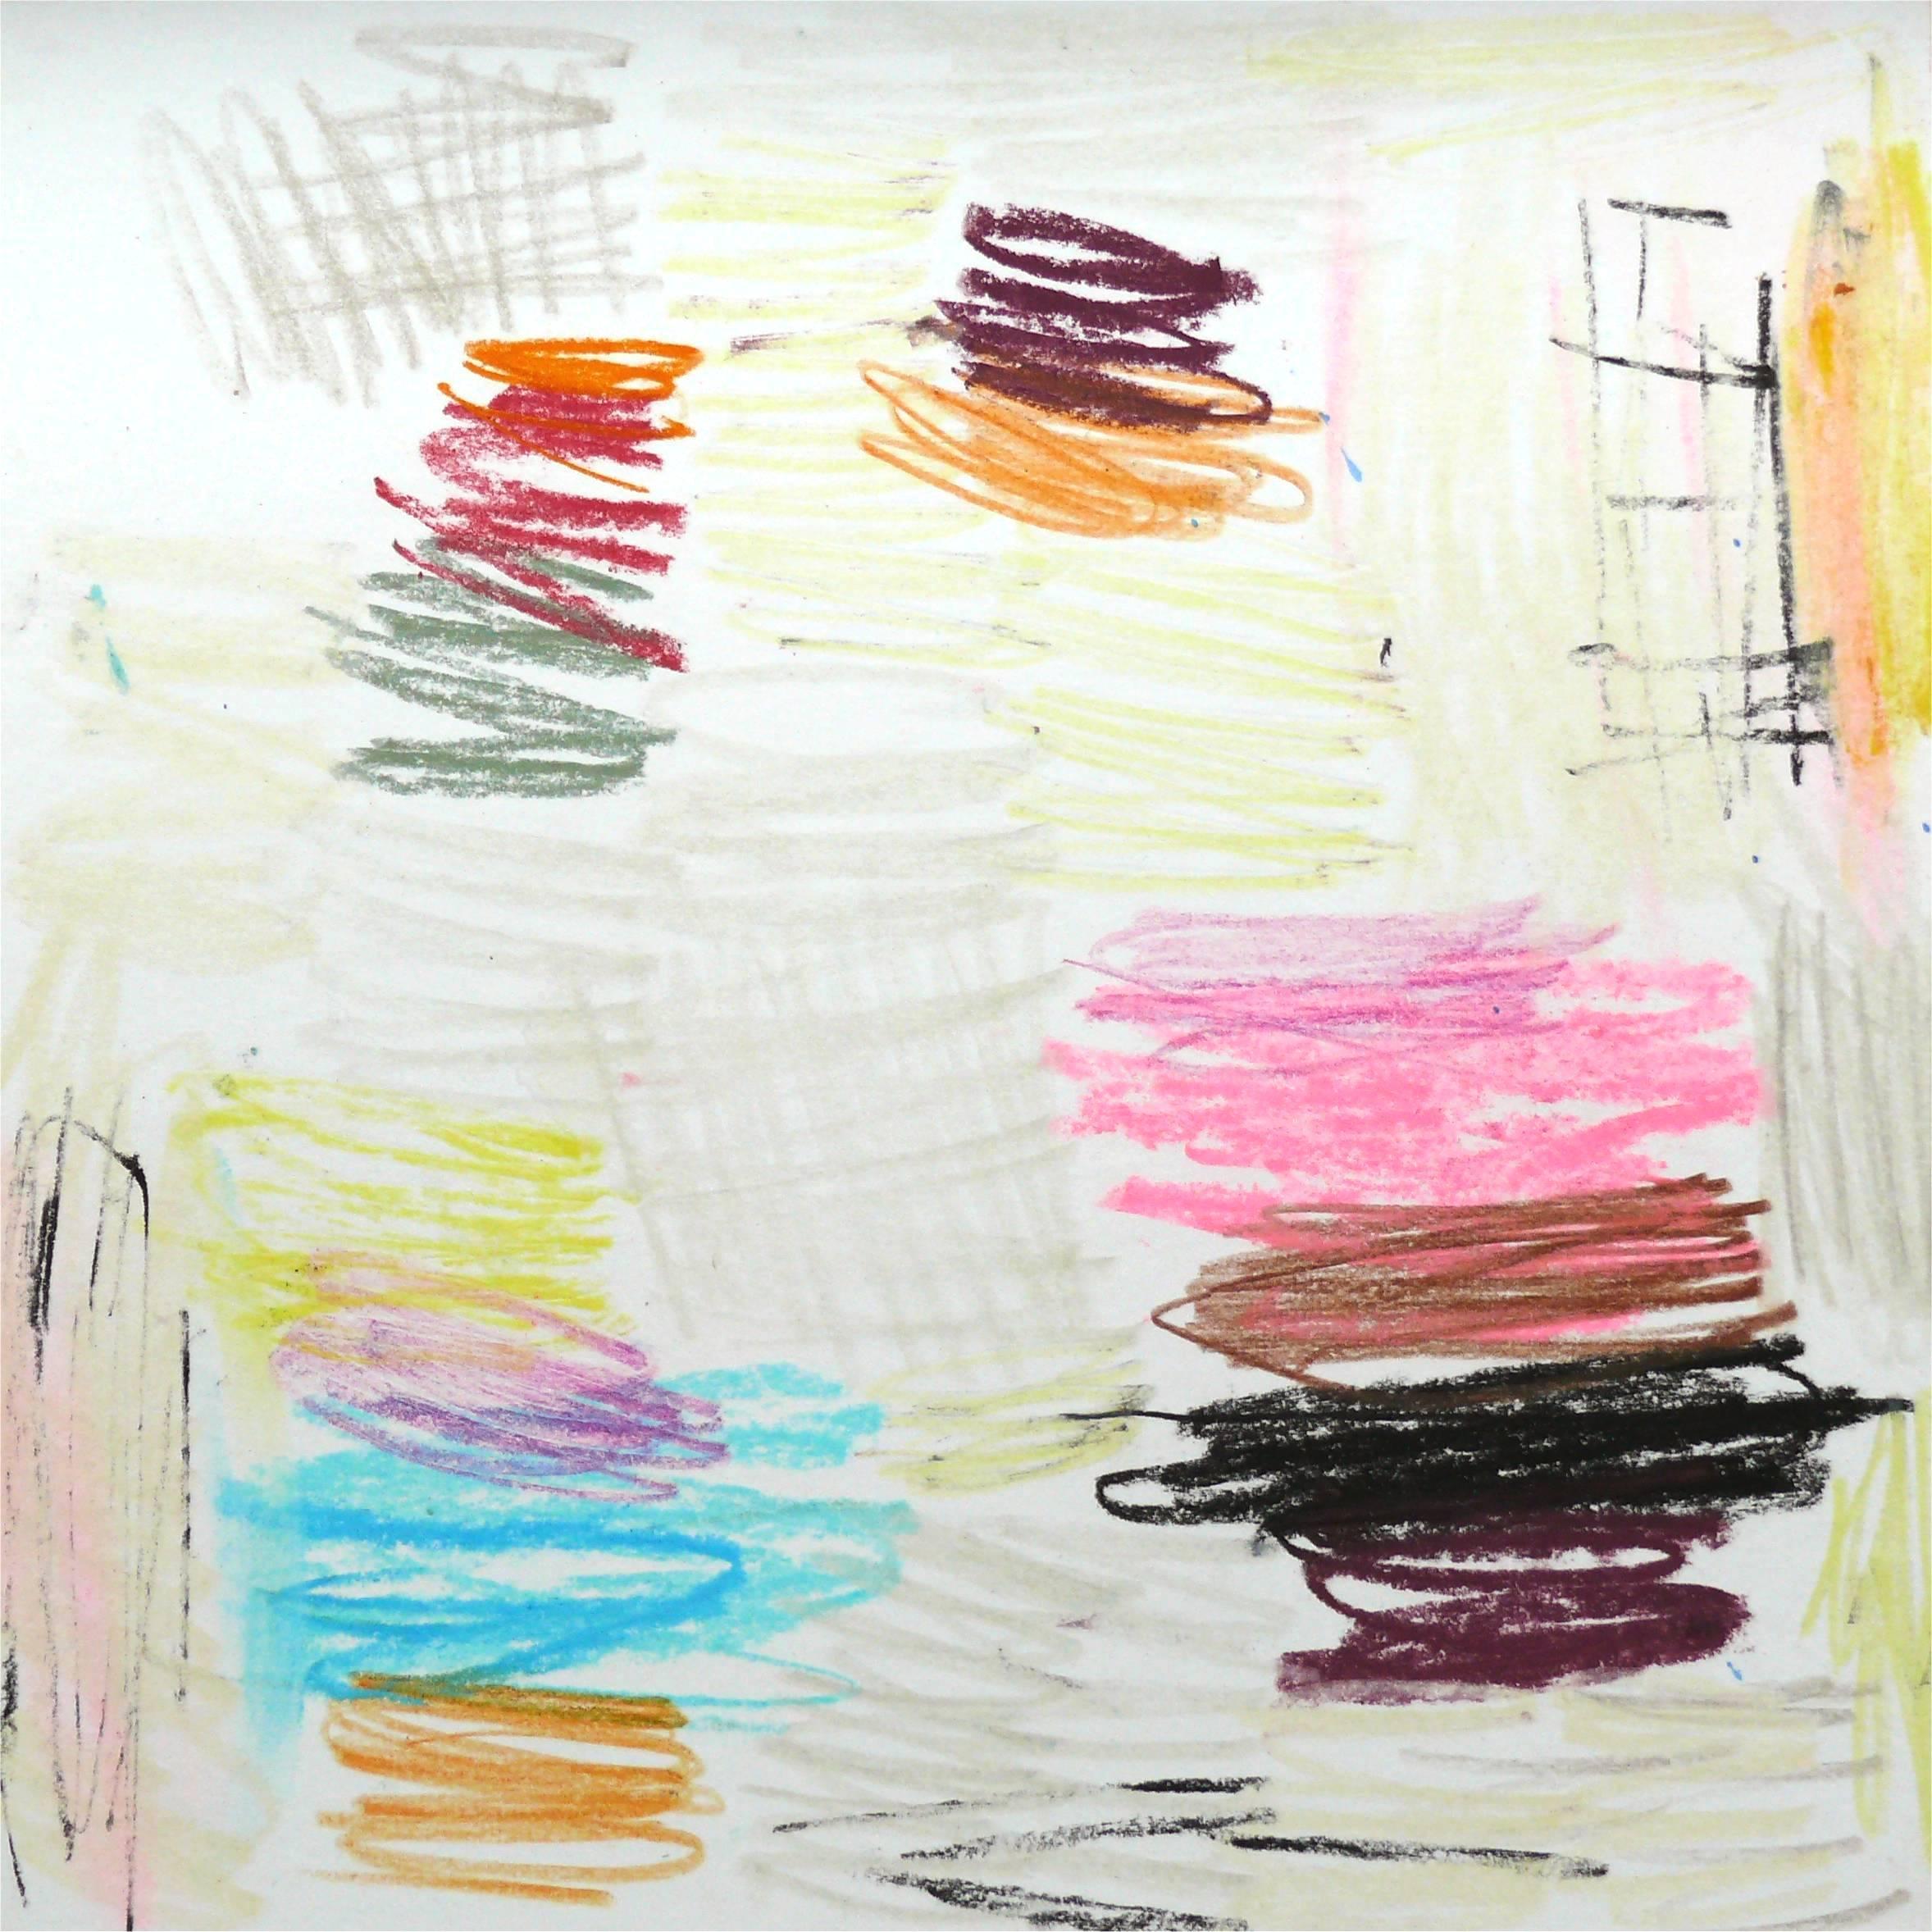 15_Pastellkreide auf Karton 20x20 cm